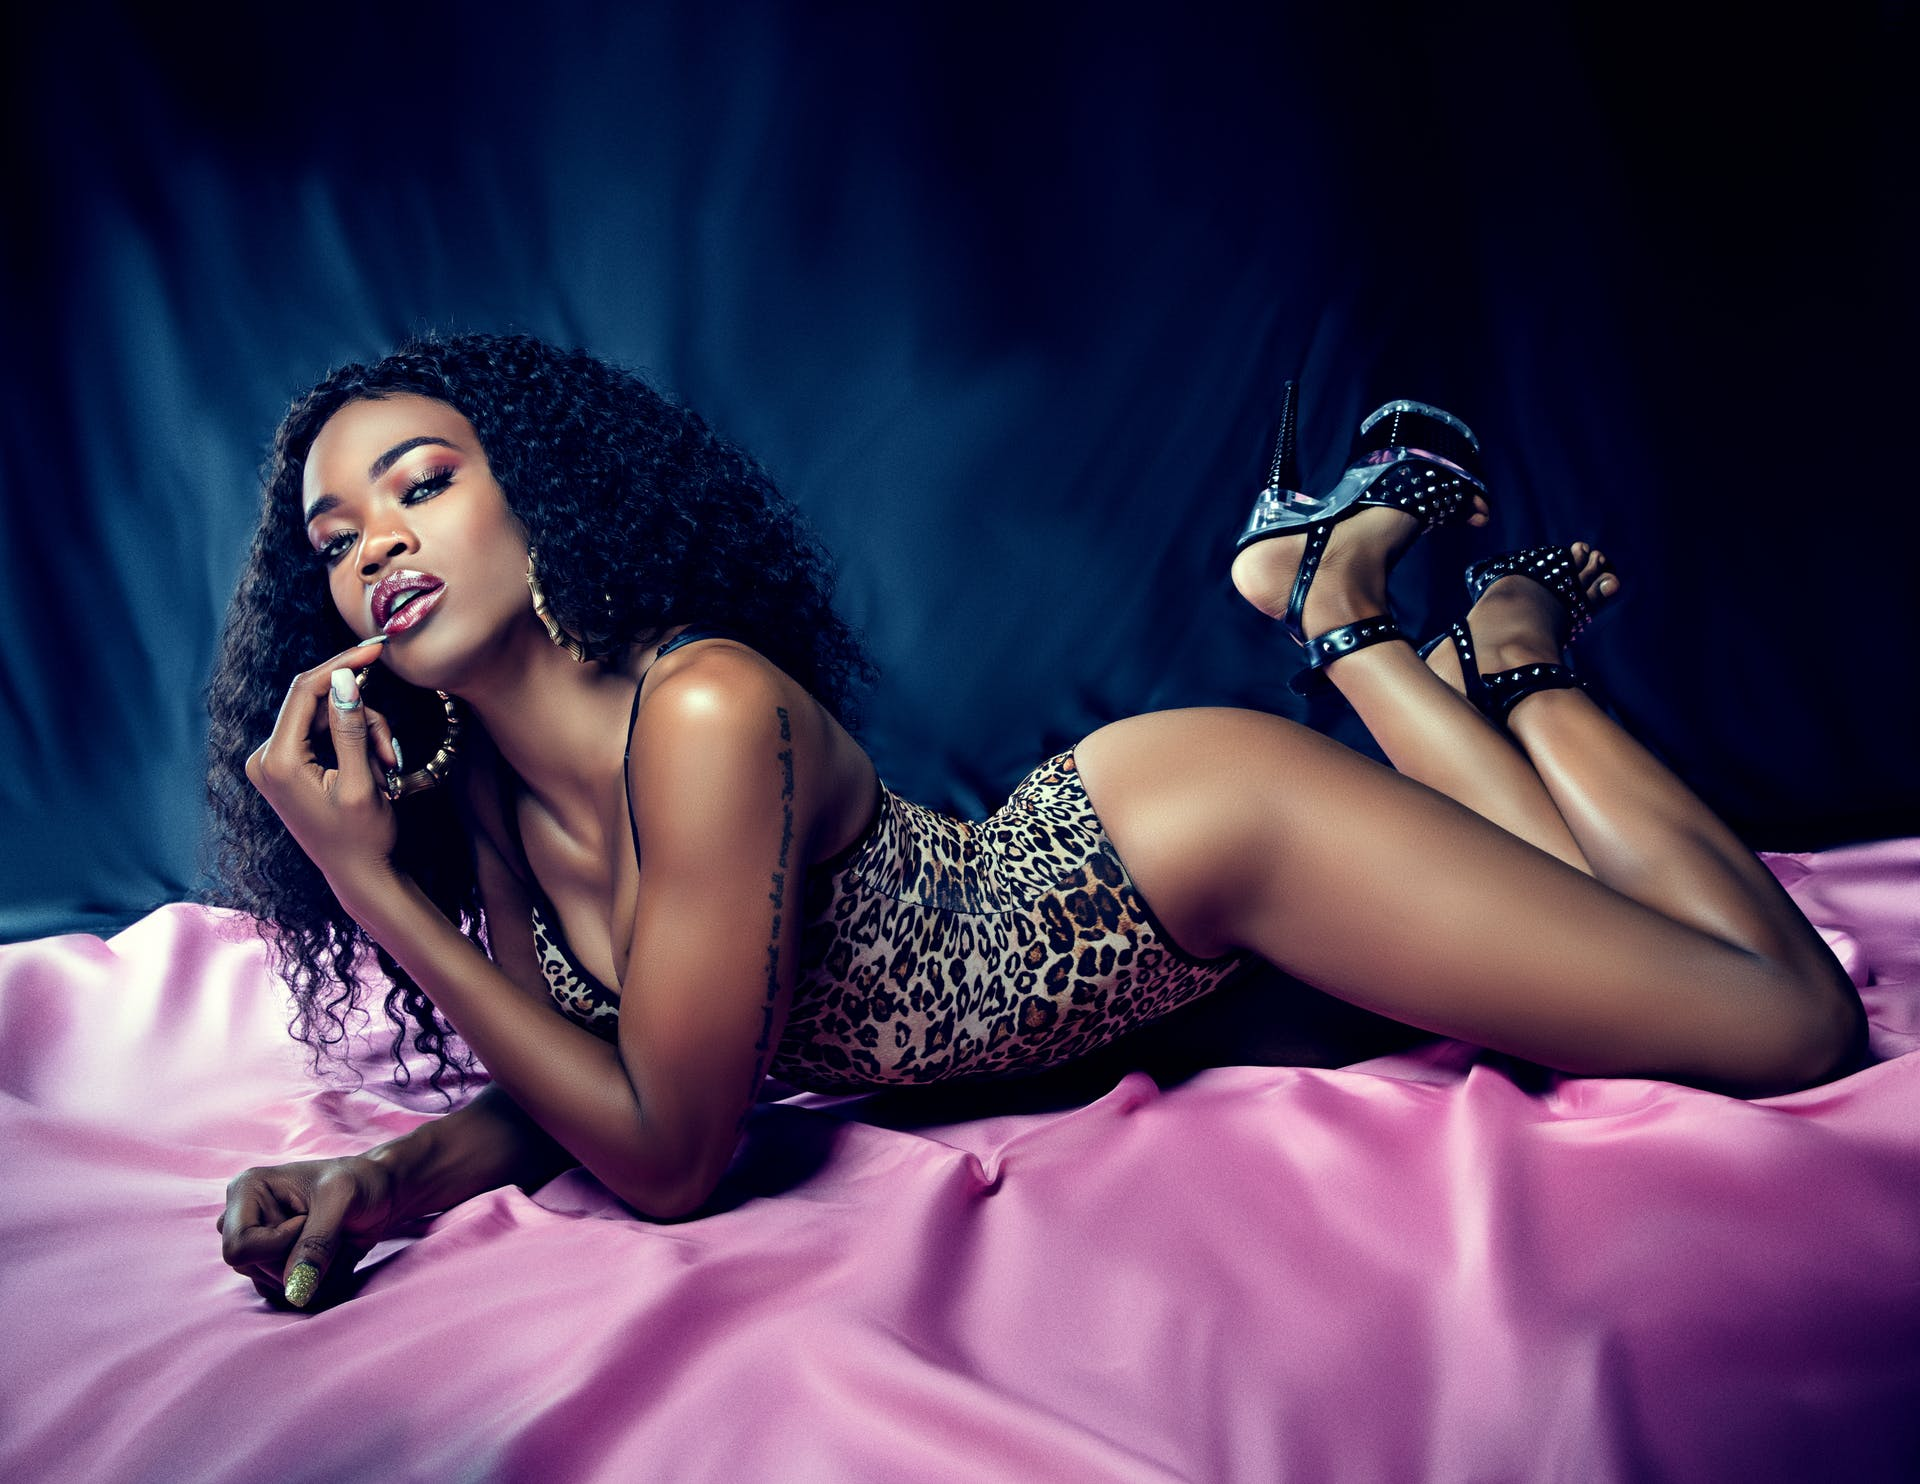 erotic woman beauty pretty beautiful photoshoot female bedroom indoors silk